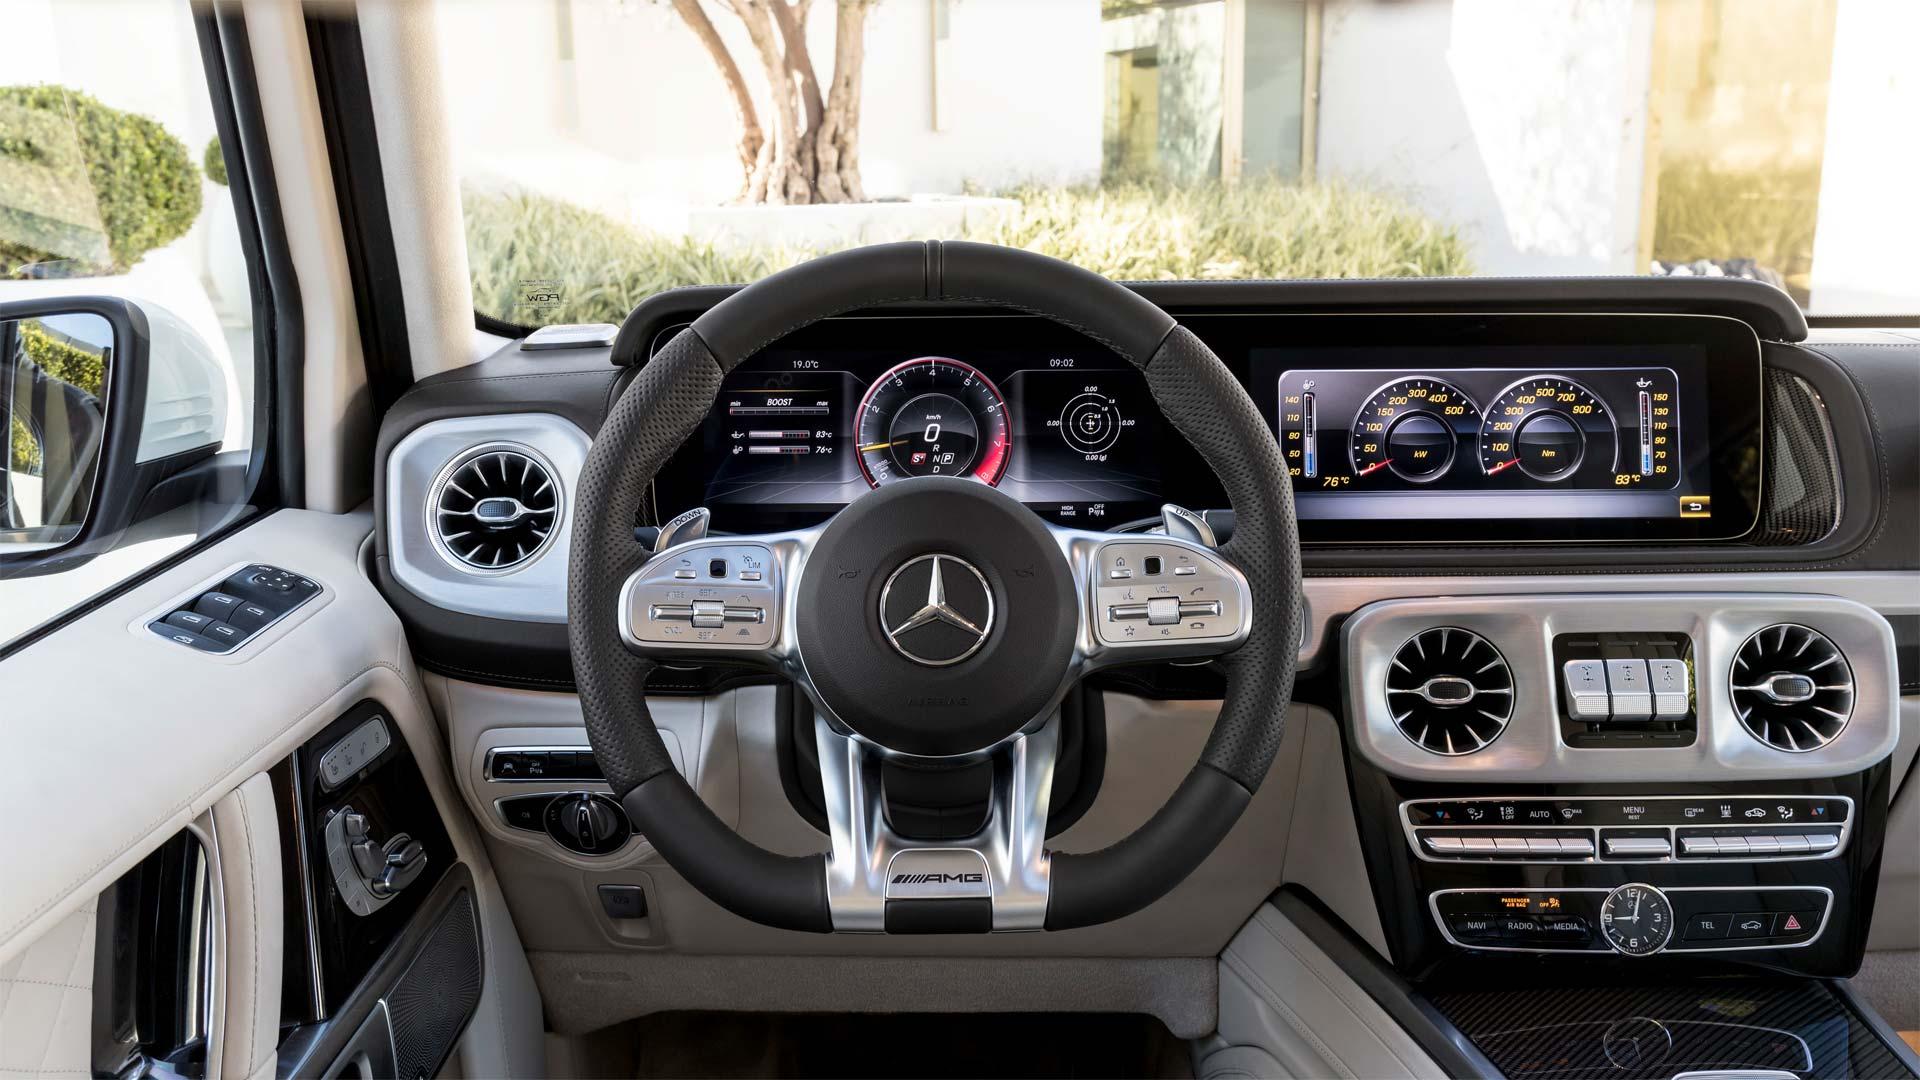 2018-Mercedes-AMG-G-63-Interior_2